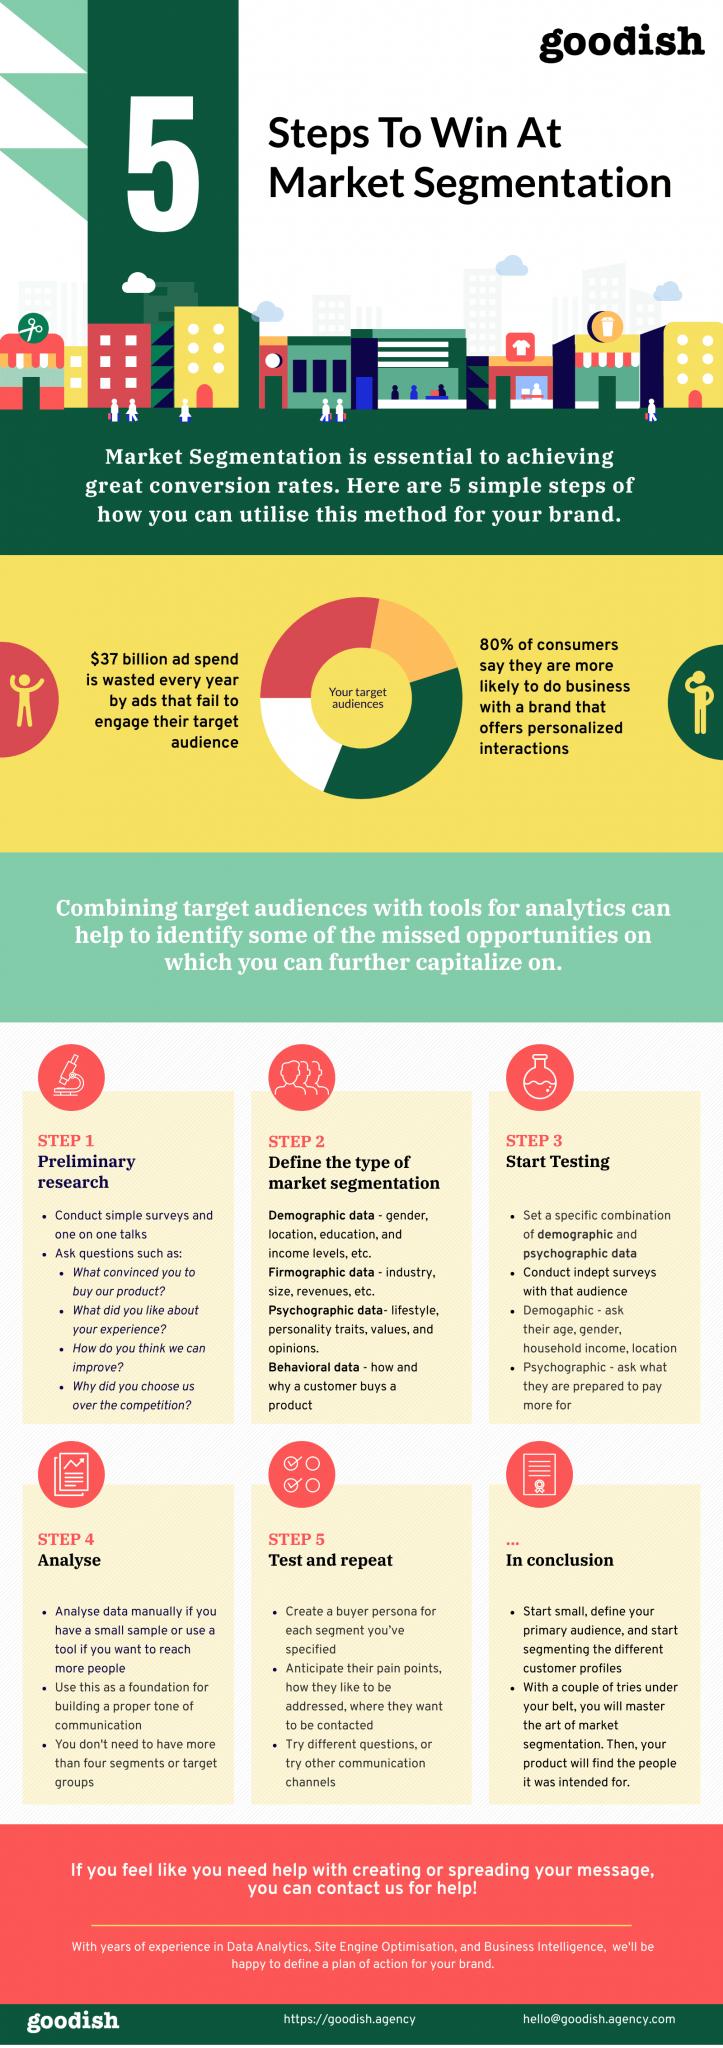 5 steps to market segmentation goodish agency infographic